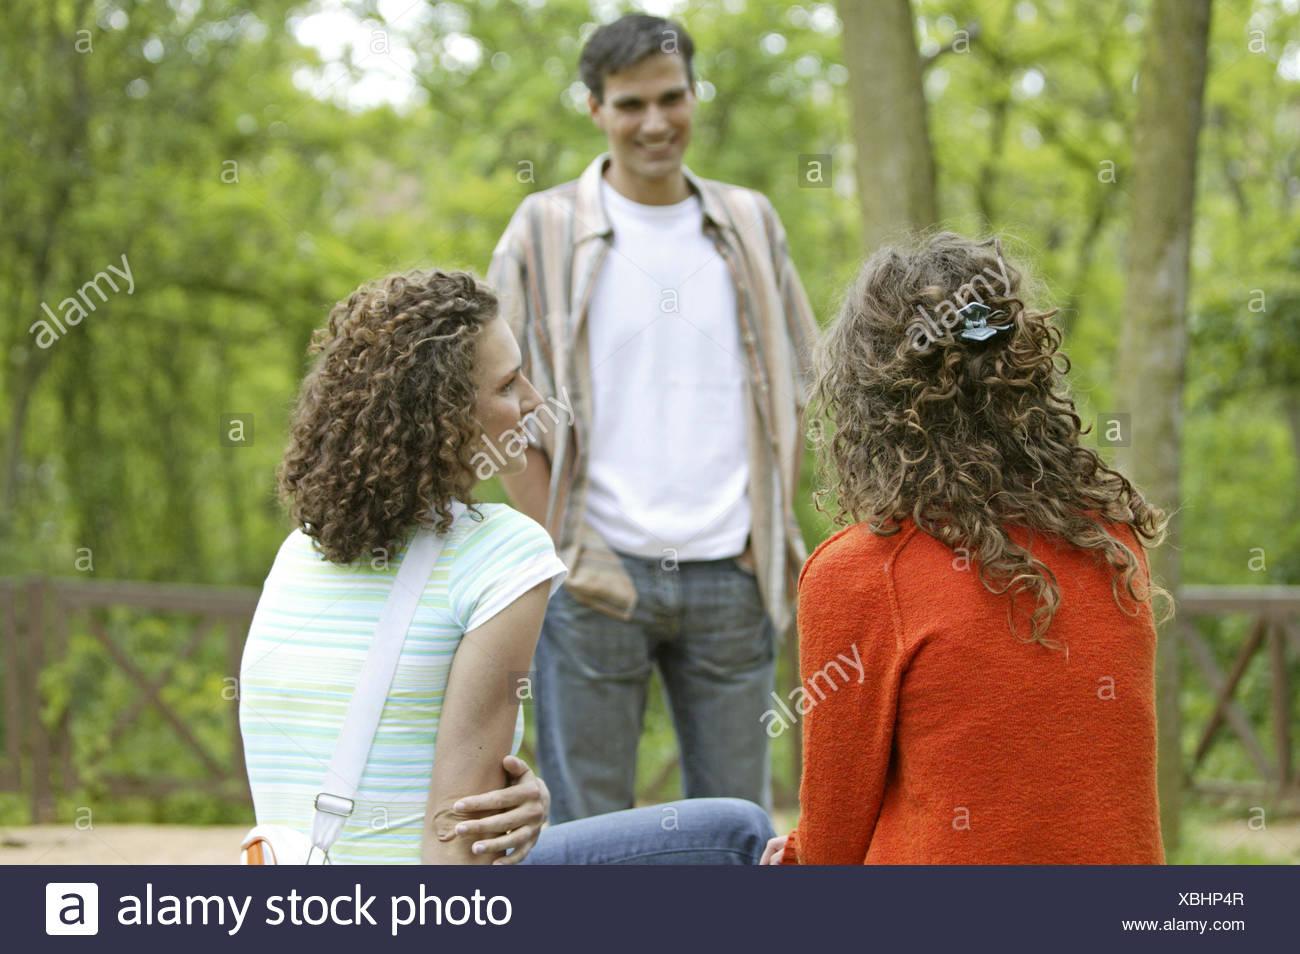 Frauen Jung Zwei Flirten Mann Sommer Schauen Nach Bewundern